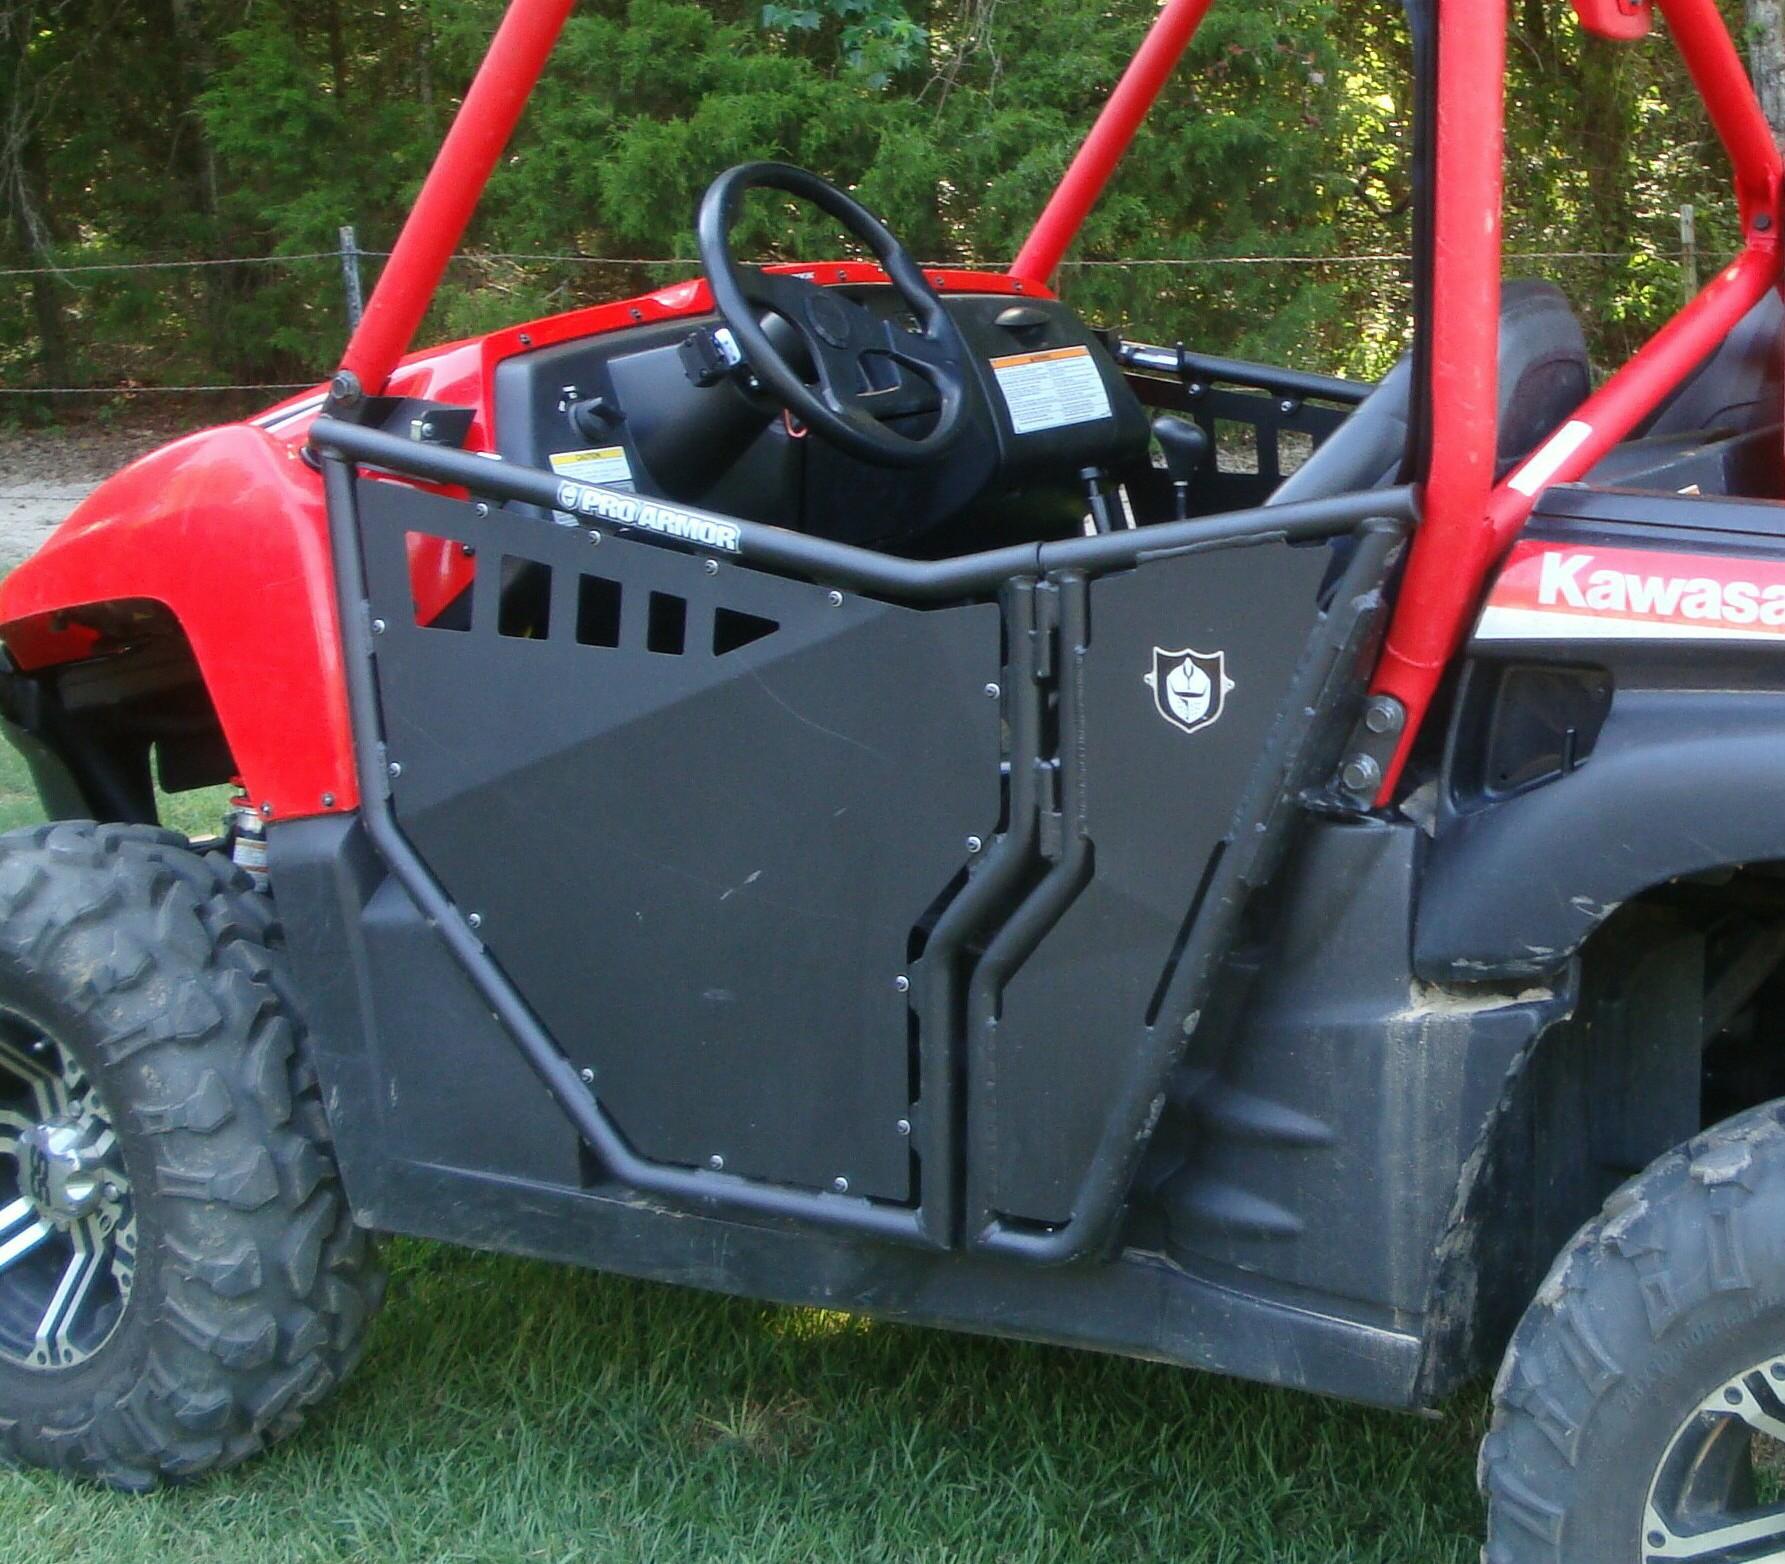 & My New Pro Armor Doors - Kawasaki Teryx Forum pezcame.com